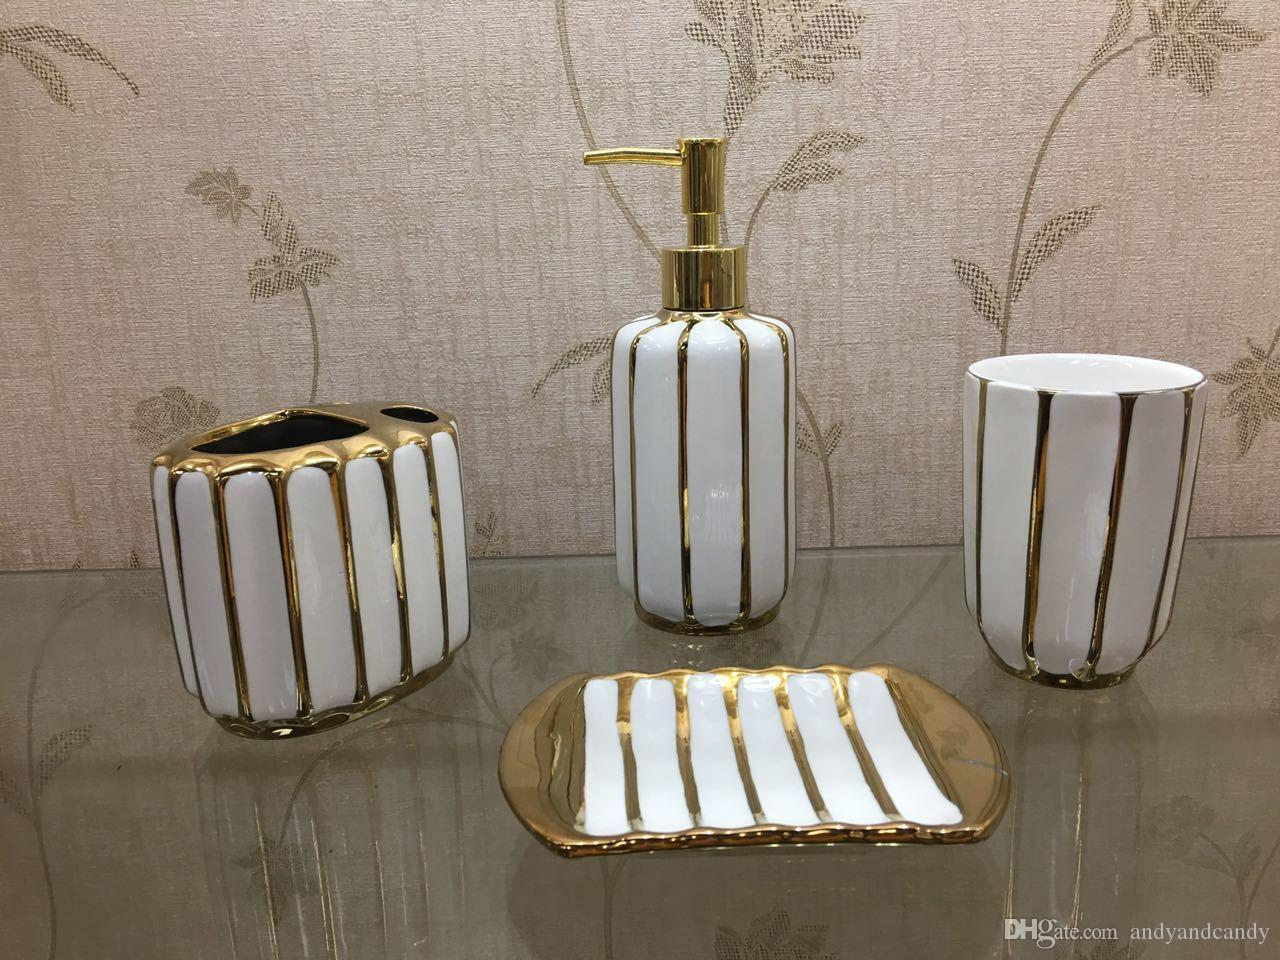 4Pcs/Set Bathroom Set Accessories Ceramic Bathroom Suit Include Cup Toothbrush Holder Soap Dish Dispenser Shampoo lotion Bottle